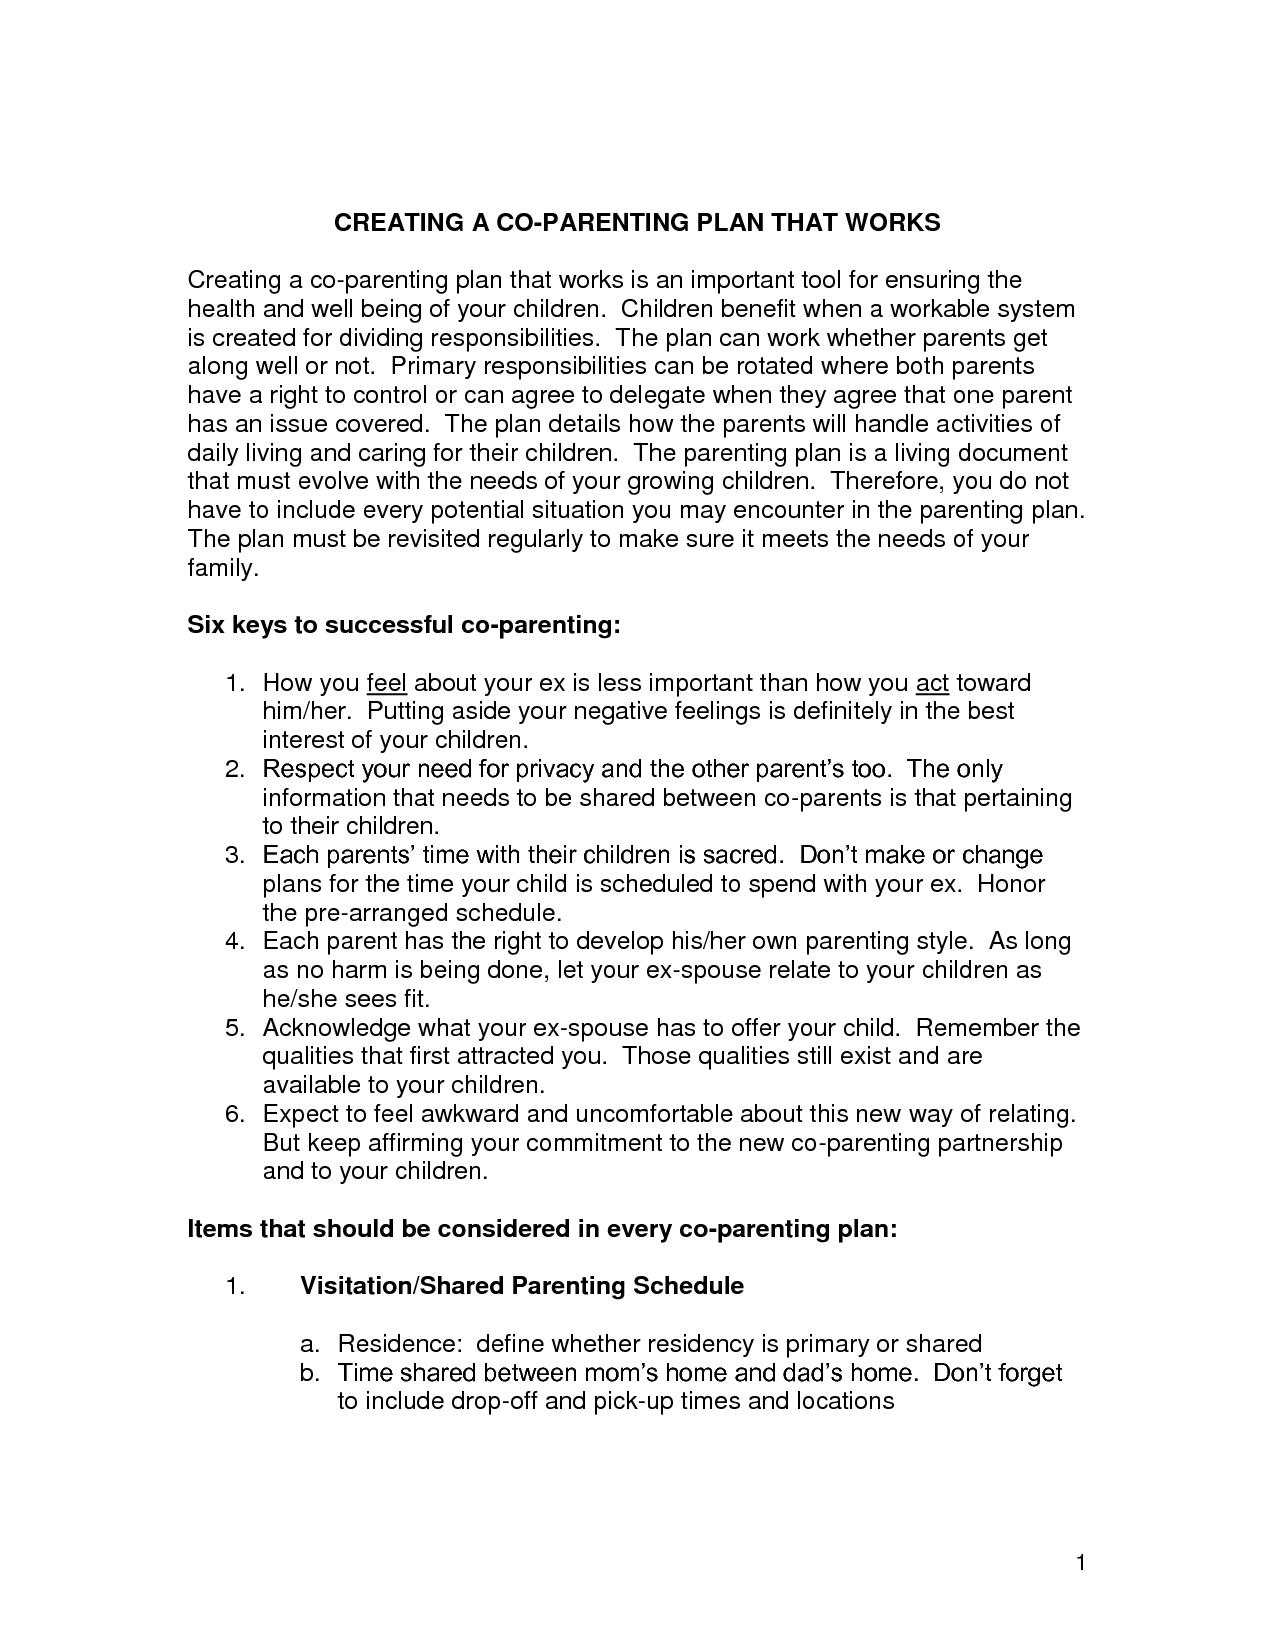 Authoritative Parenting Worksheet